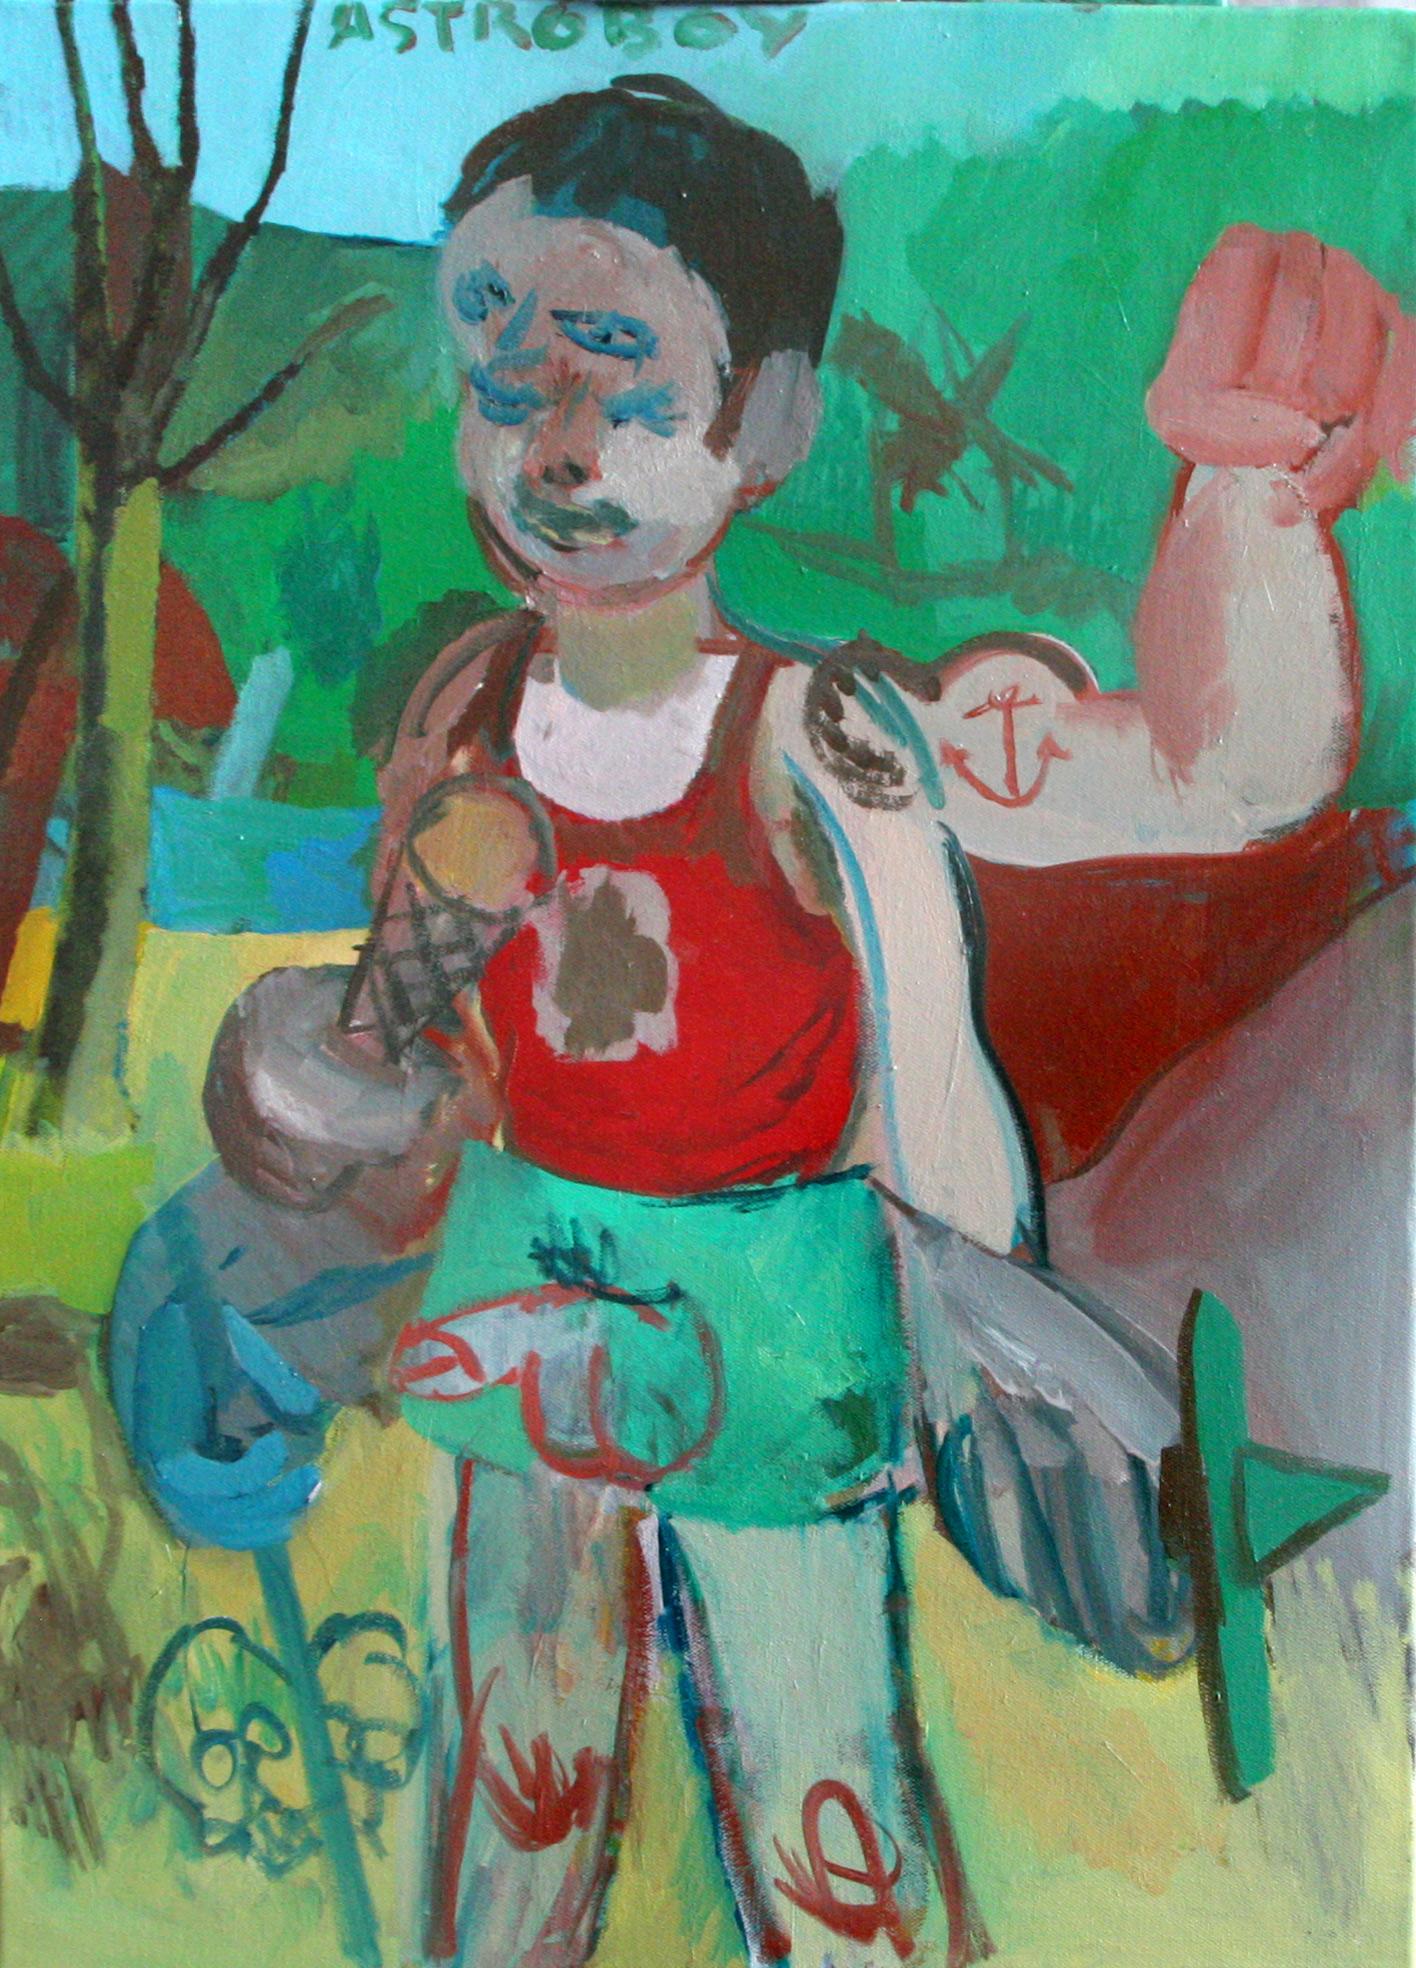 """Astro Boy"" 2012   Oil on canvas. 70 x 50 cm"